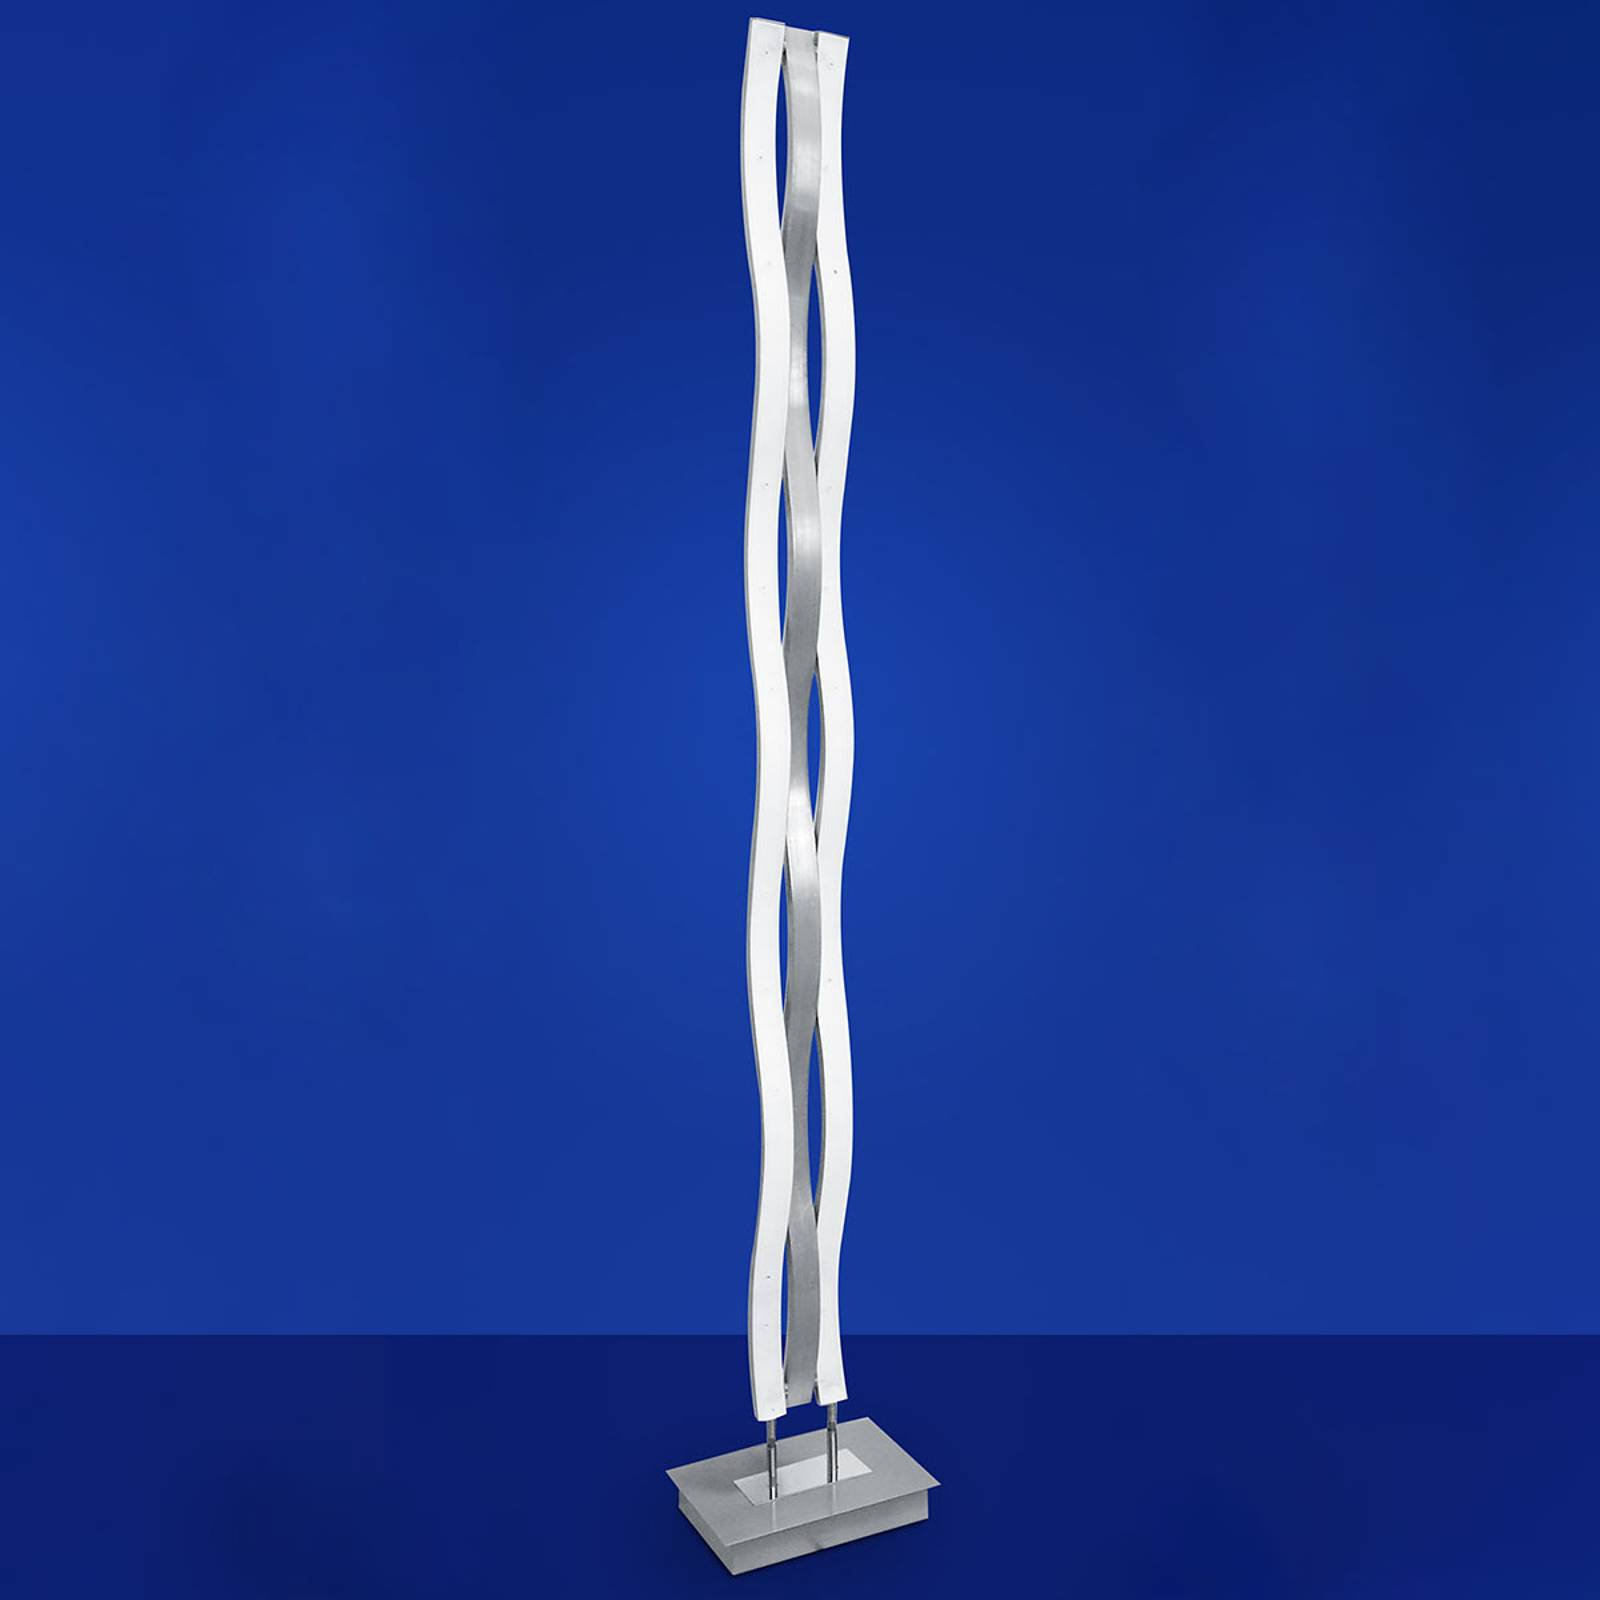 B-Leuchten Helios II LED-gulvlampe